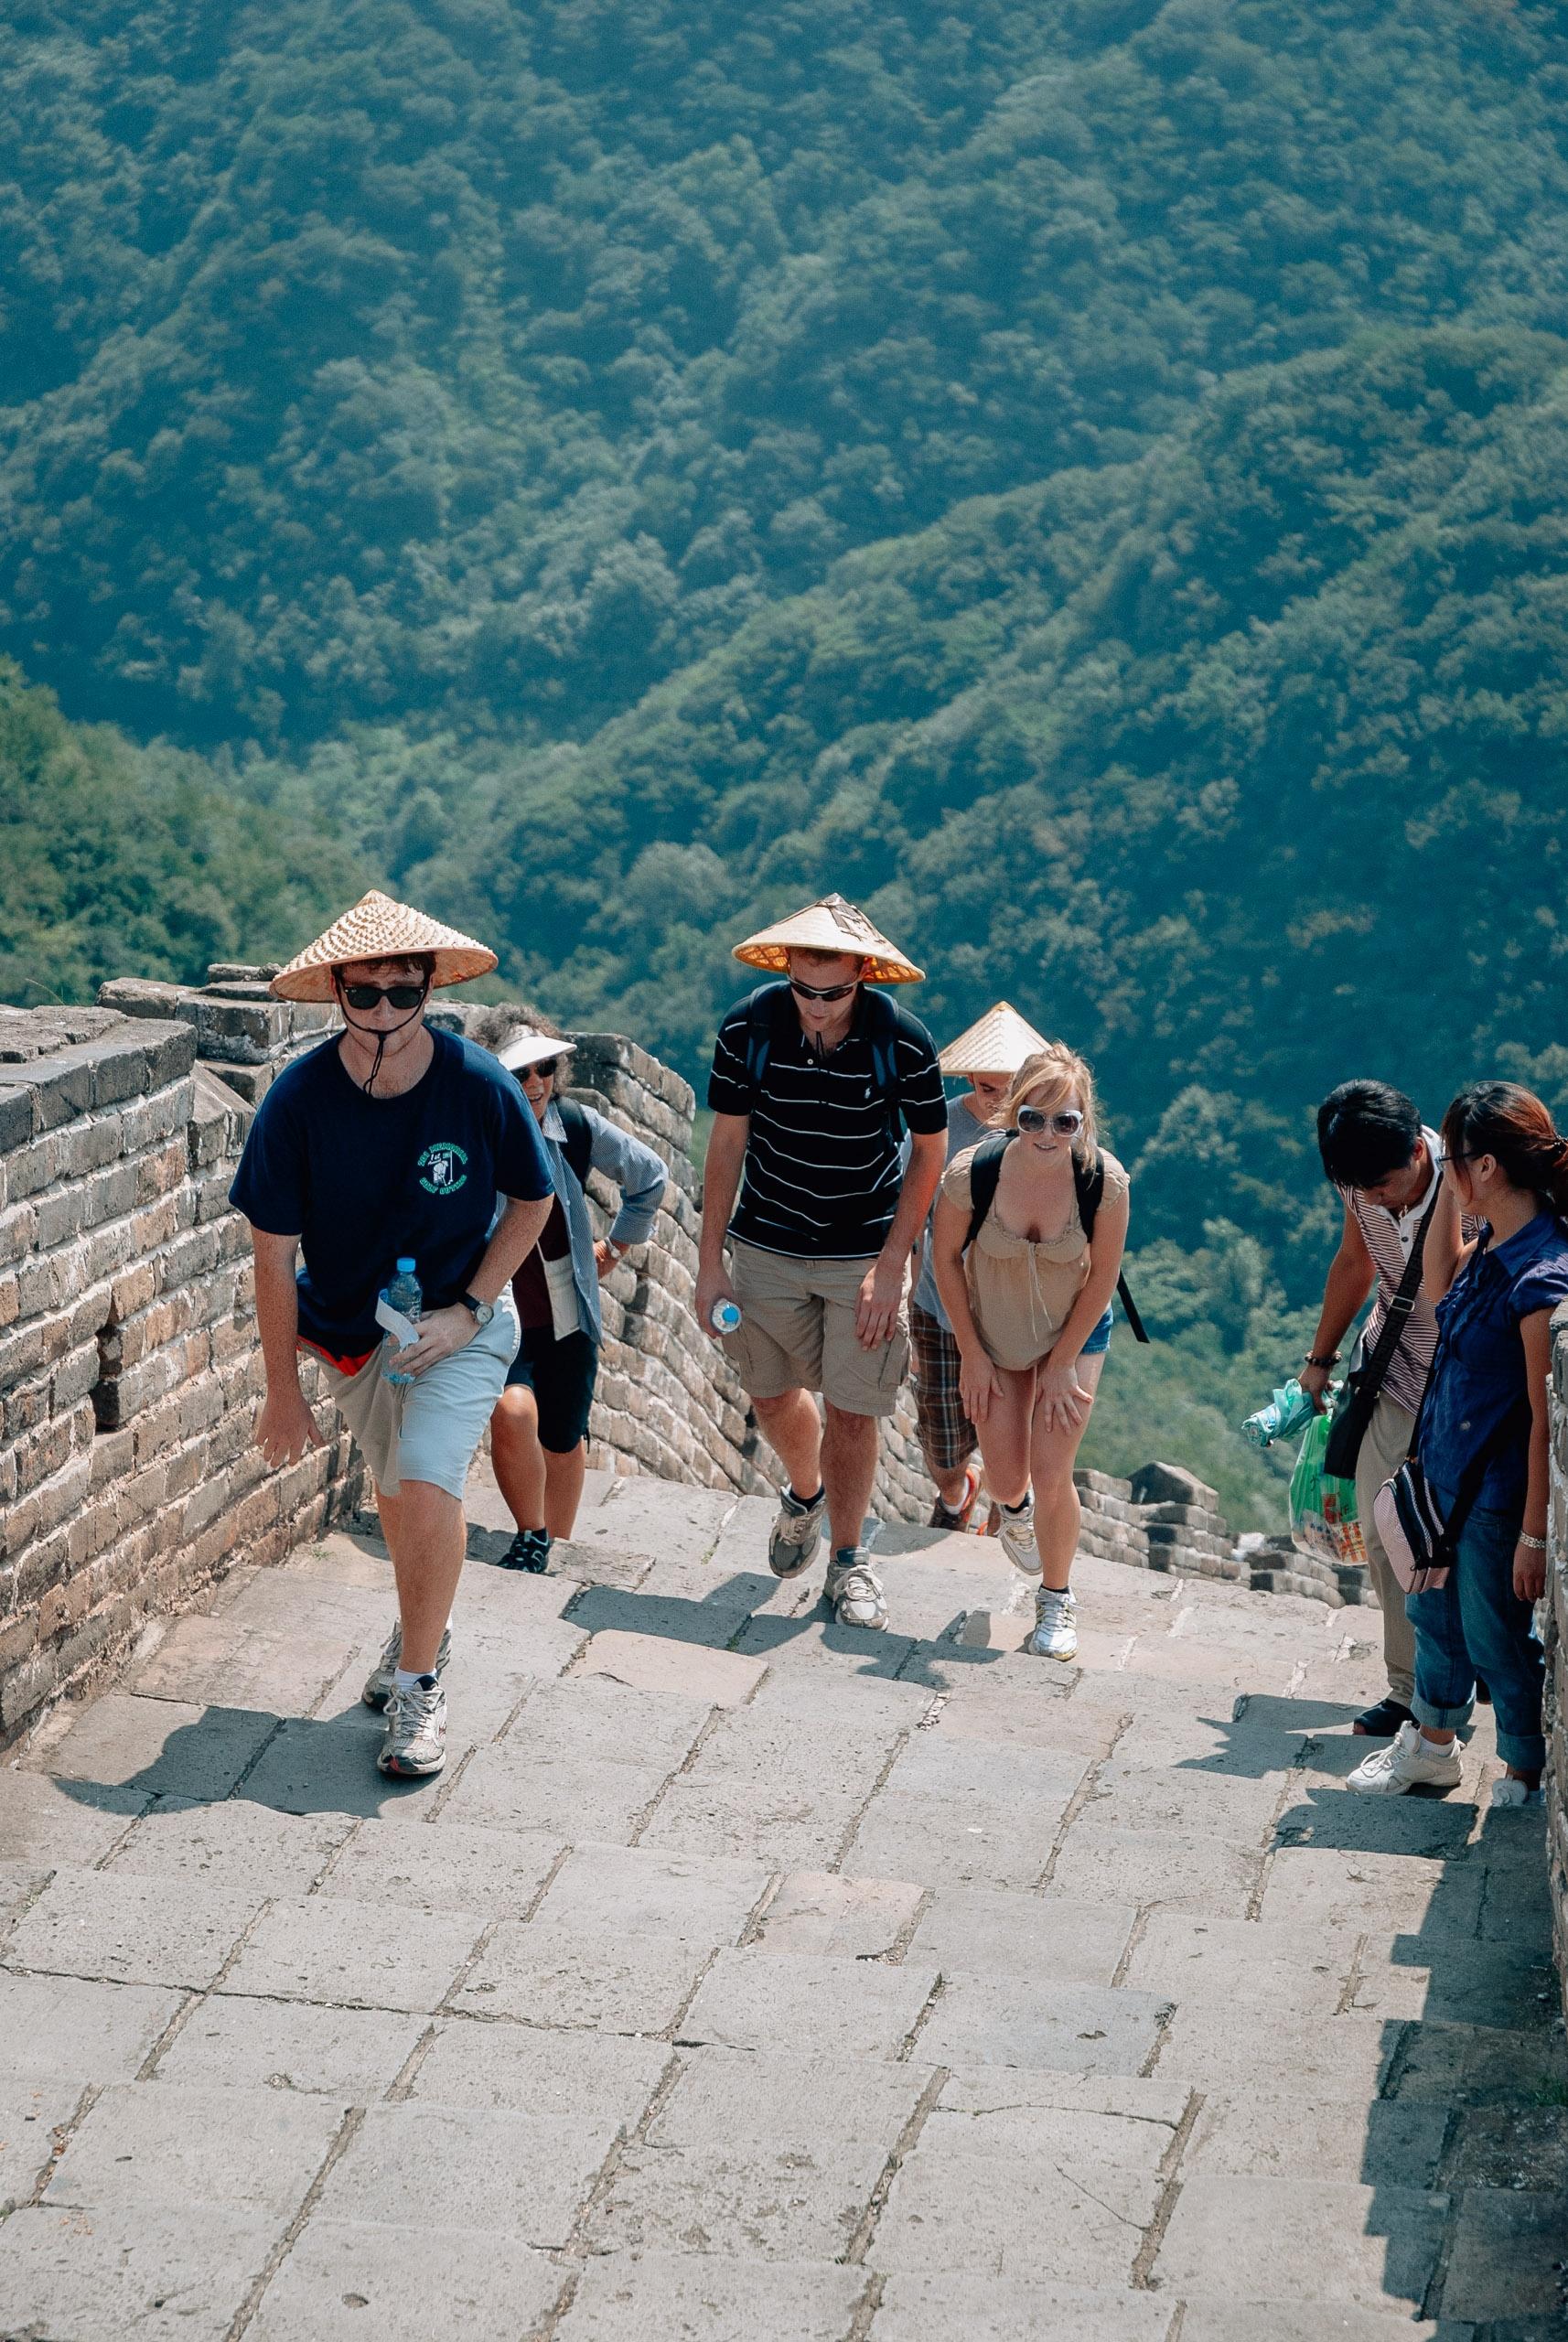 China - Beijing & The Great Wall - 2010-0902-DSC_0210_38288